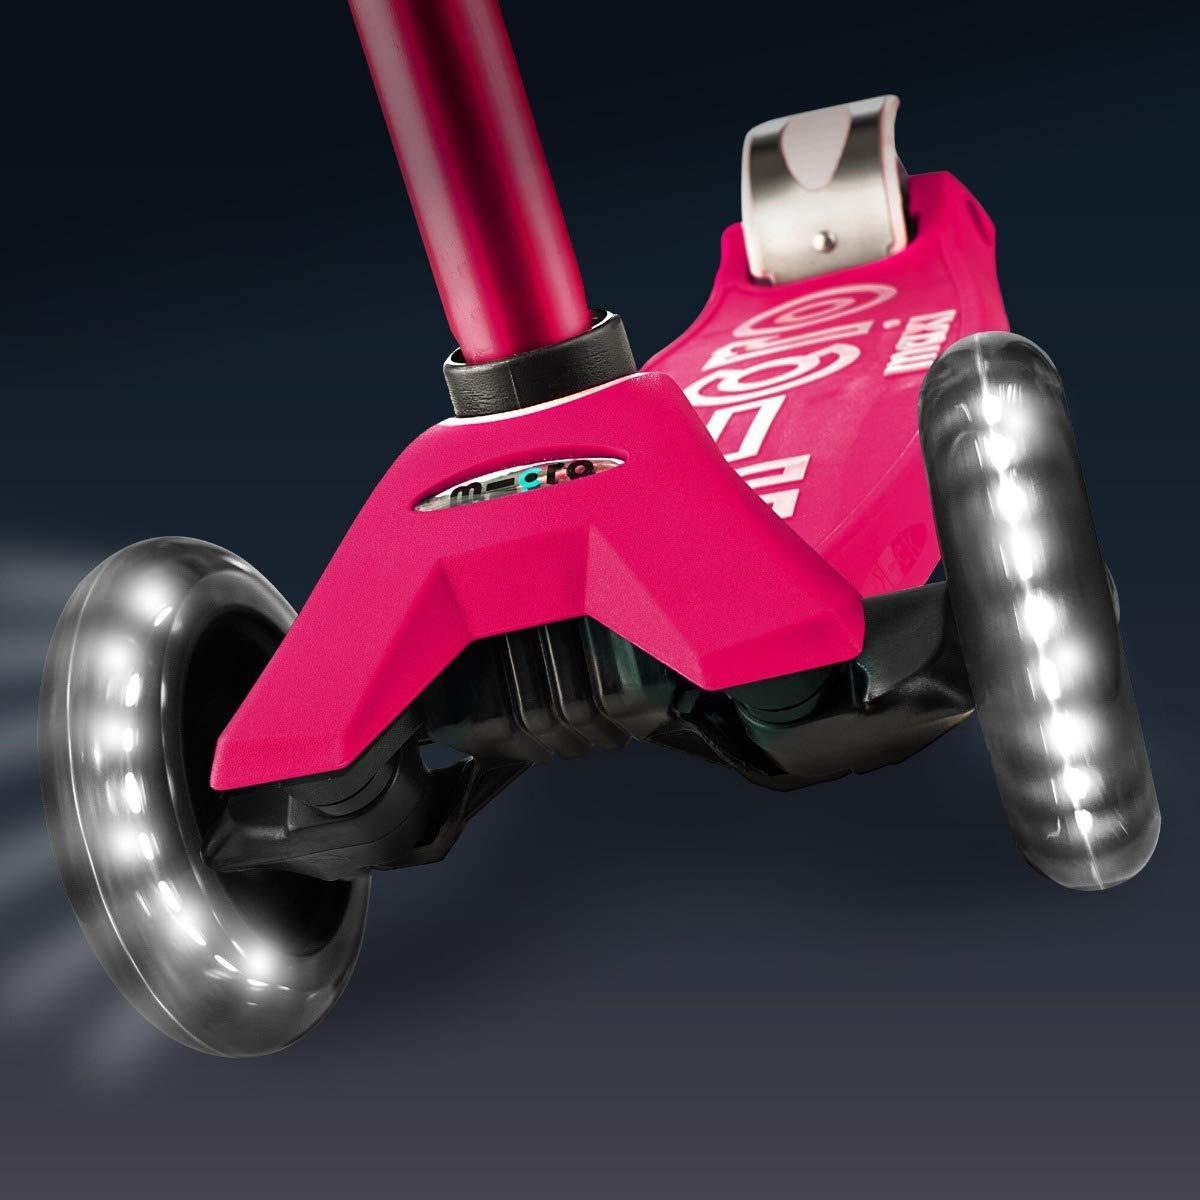 Micro Maxi Deluxe LED ( Luminous wheels )